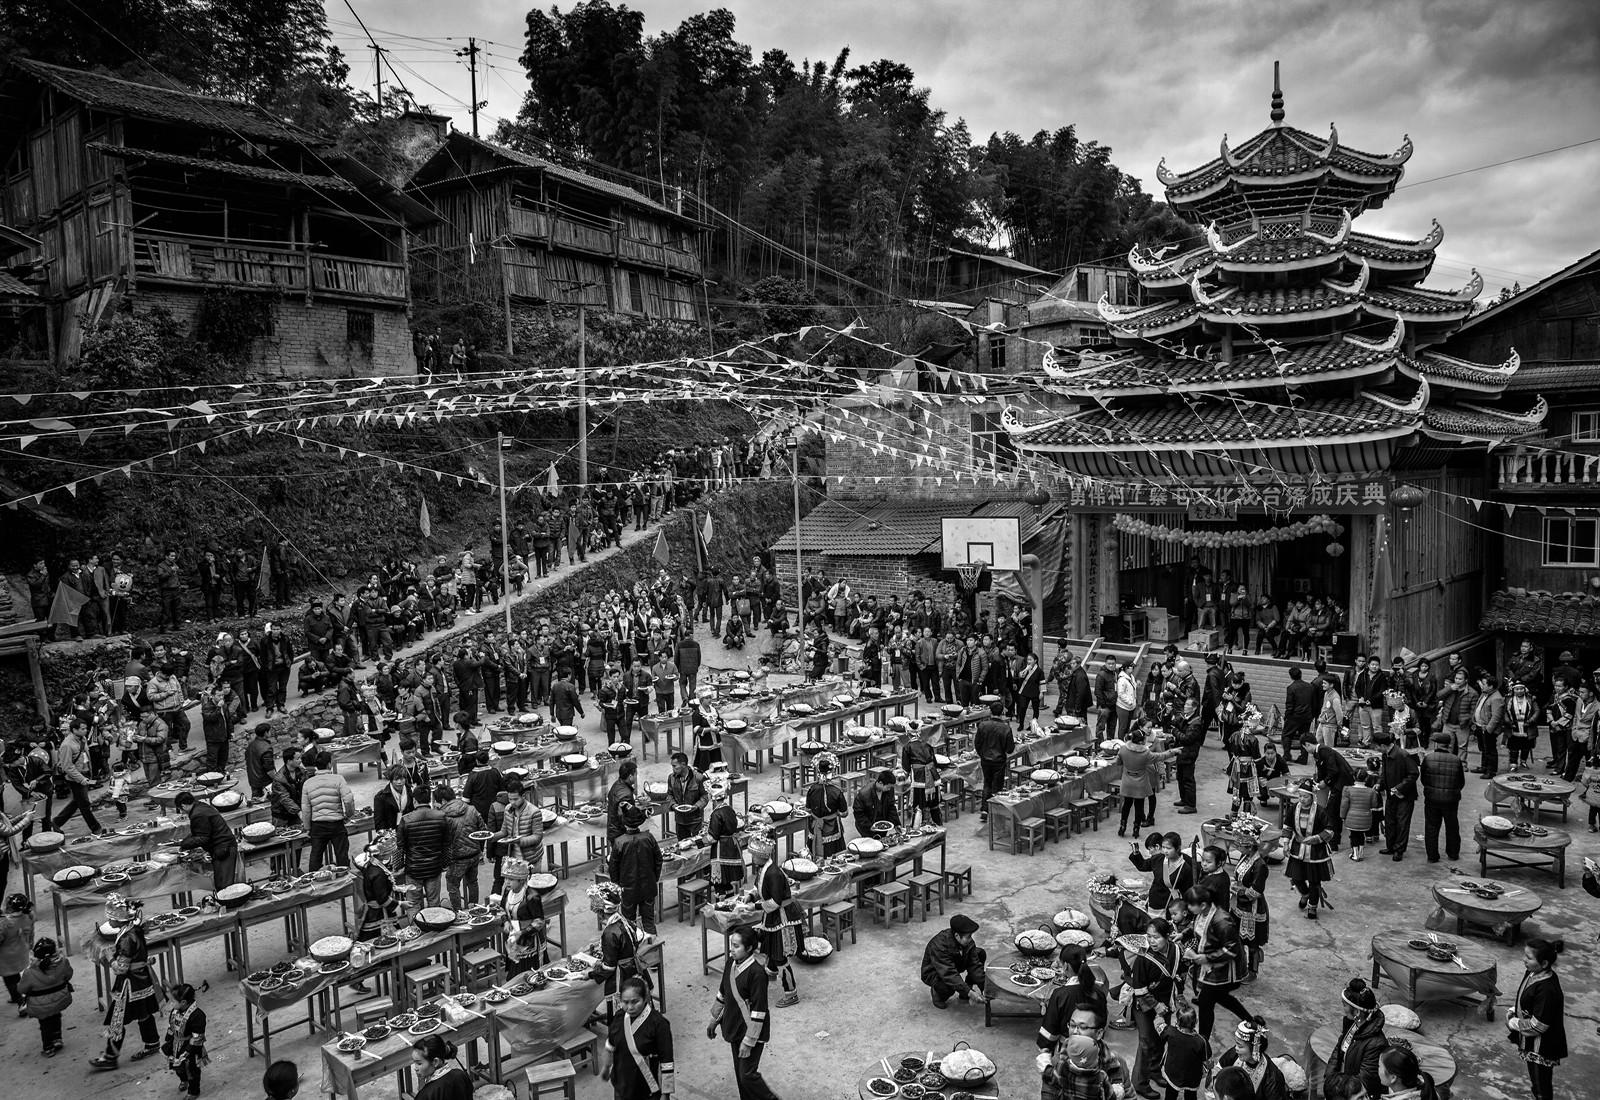 kuang-huimin-ancient-kam-rice-of-millennium-photography-of-china-(4).jpg